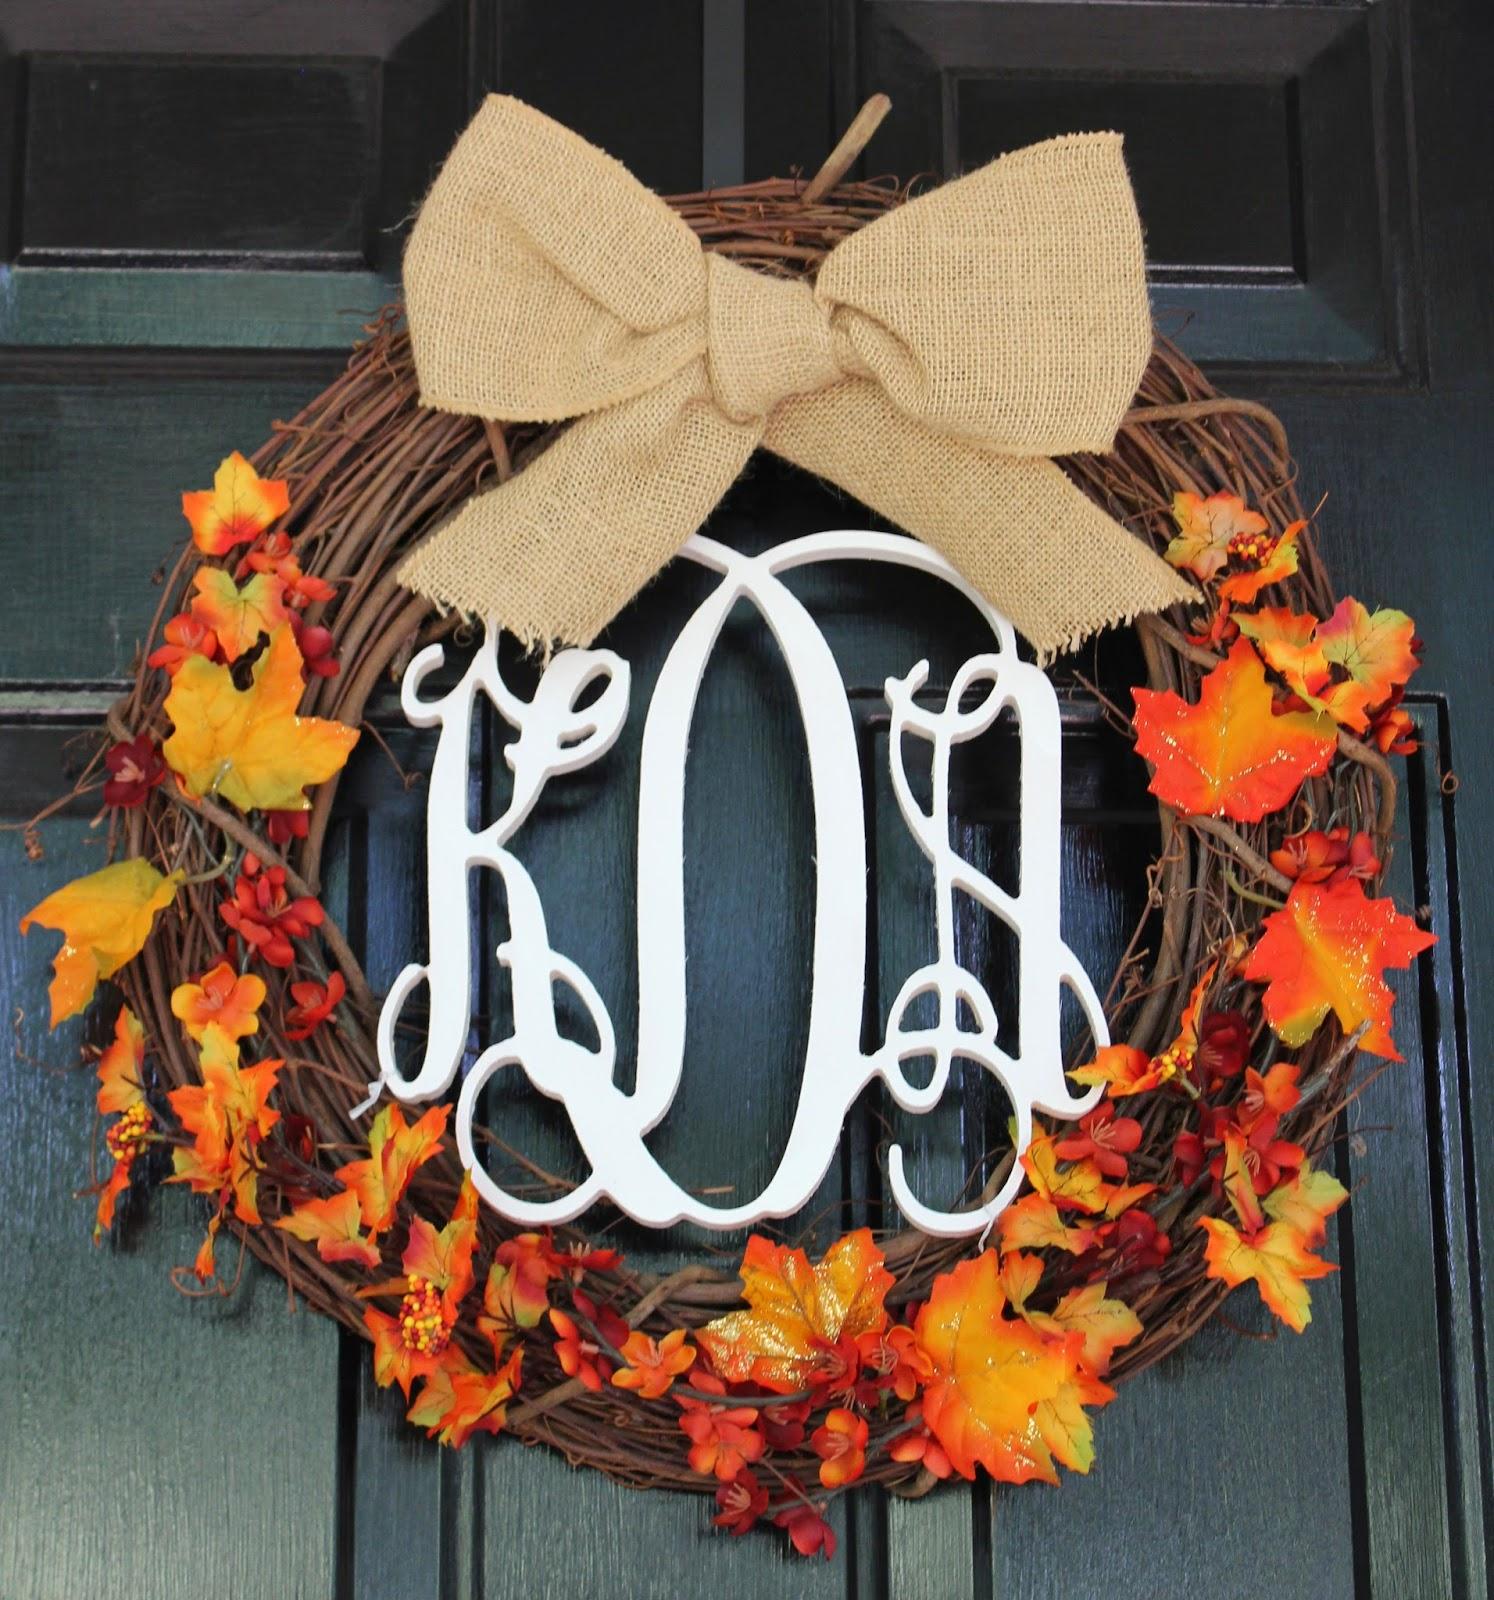 Diy Monogram Fall Wreath: Shop. Teach. Georgia Peach.: DIY Monogrammed Wreath